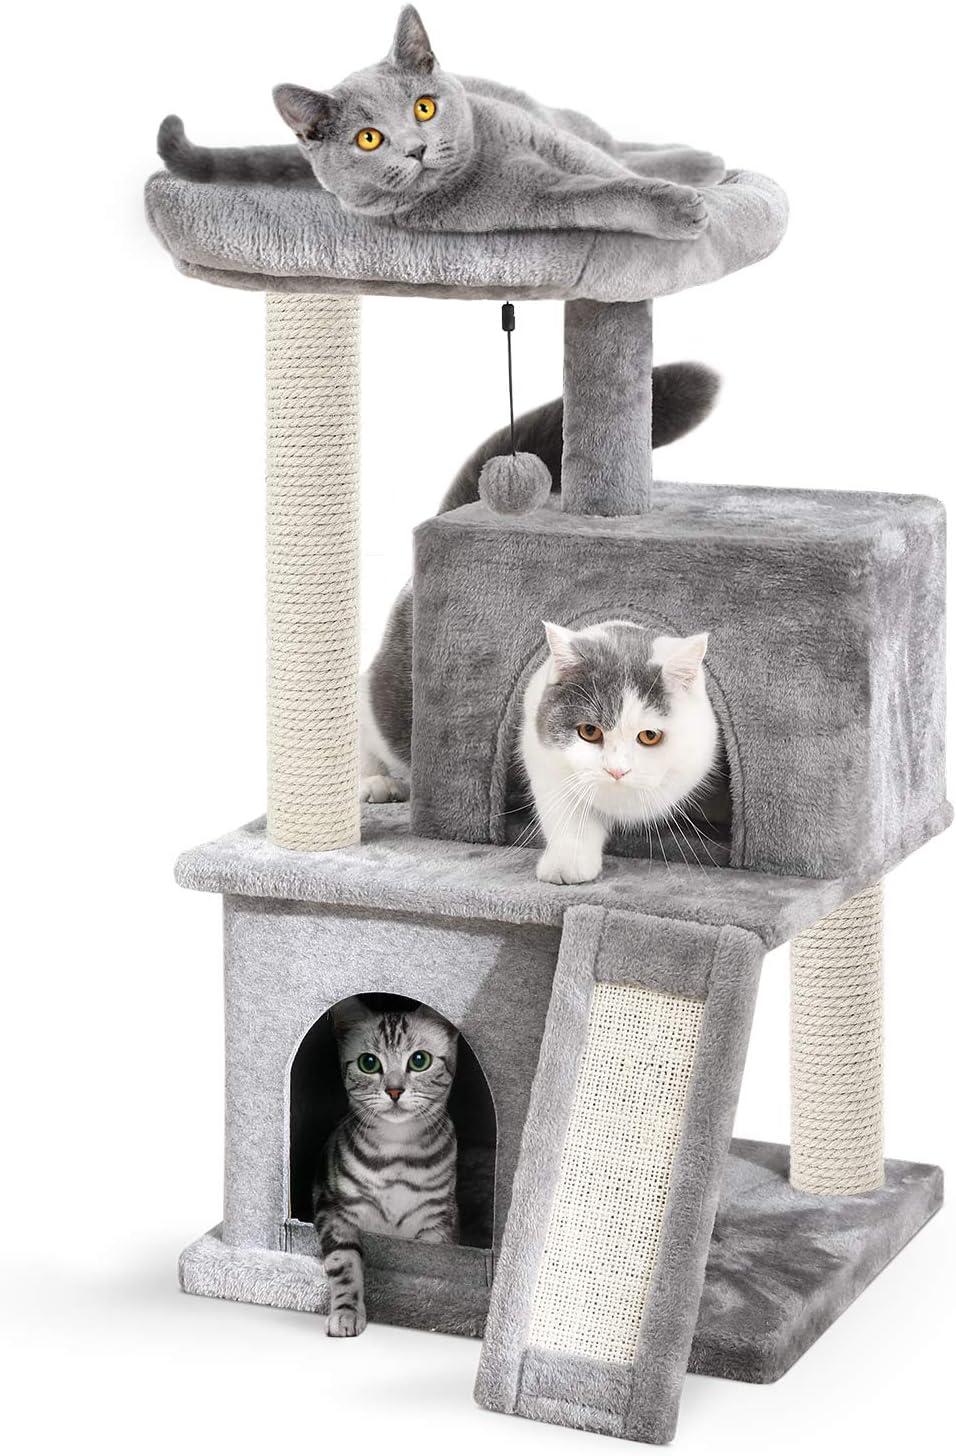 Eono by Amazon Árboles para Gatos rasguña los Postes de sisal Natural con Bola de Juguetes para Dormir de Nido Gris